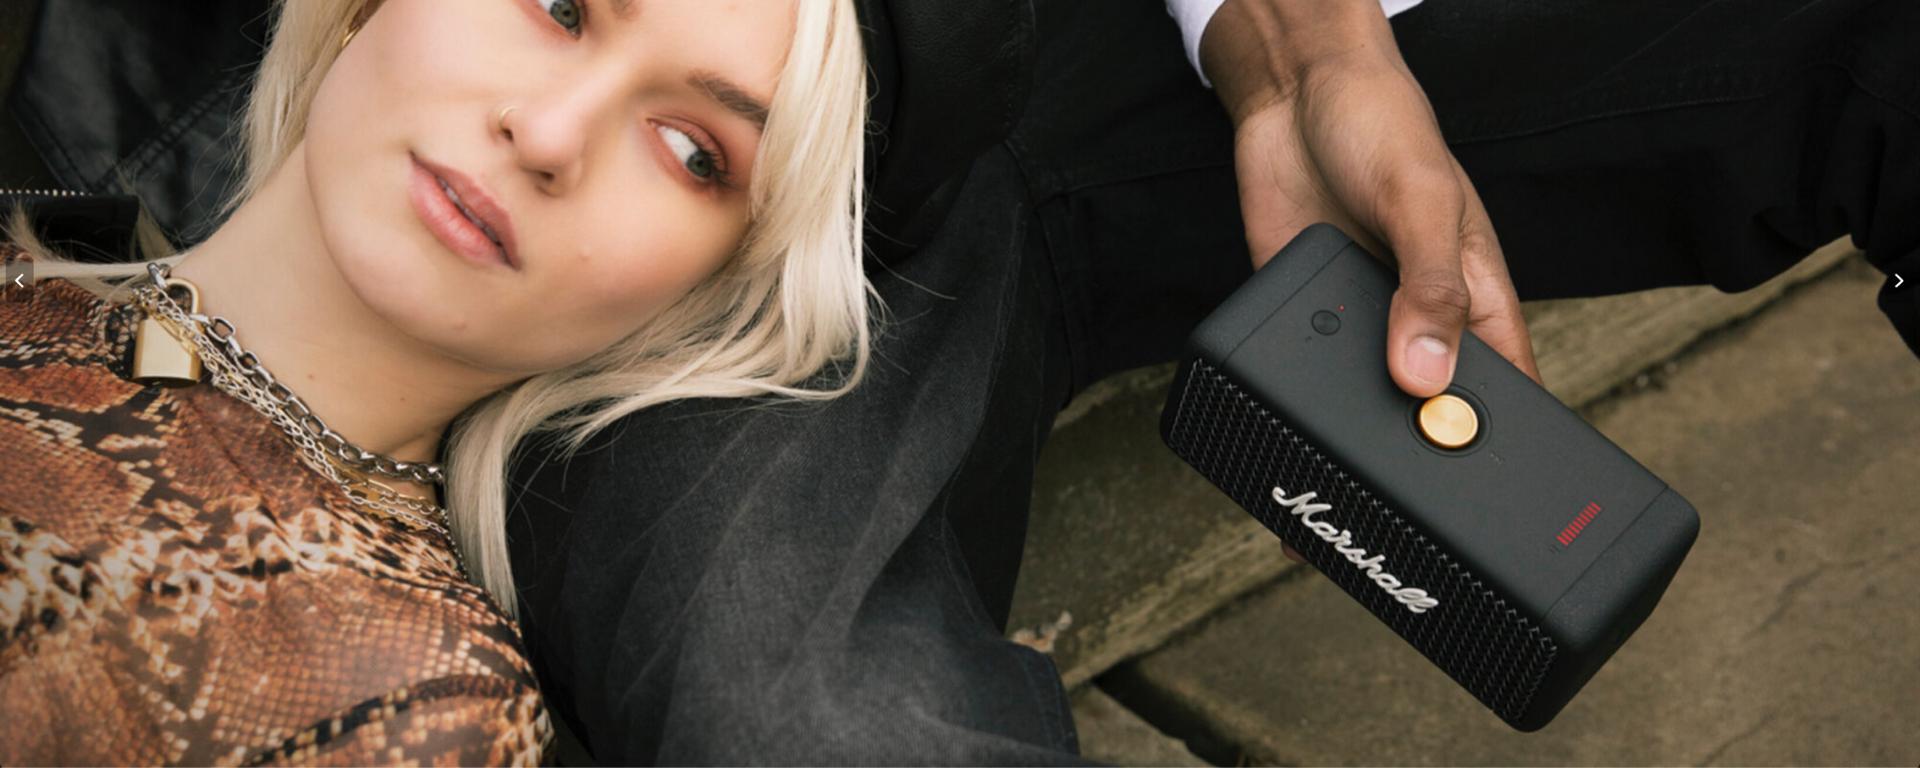 Marshall Emberton Portable Waterproof Wireless Speaker